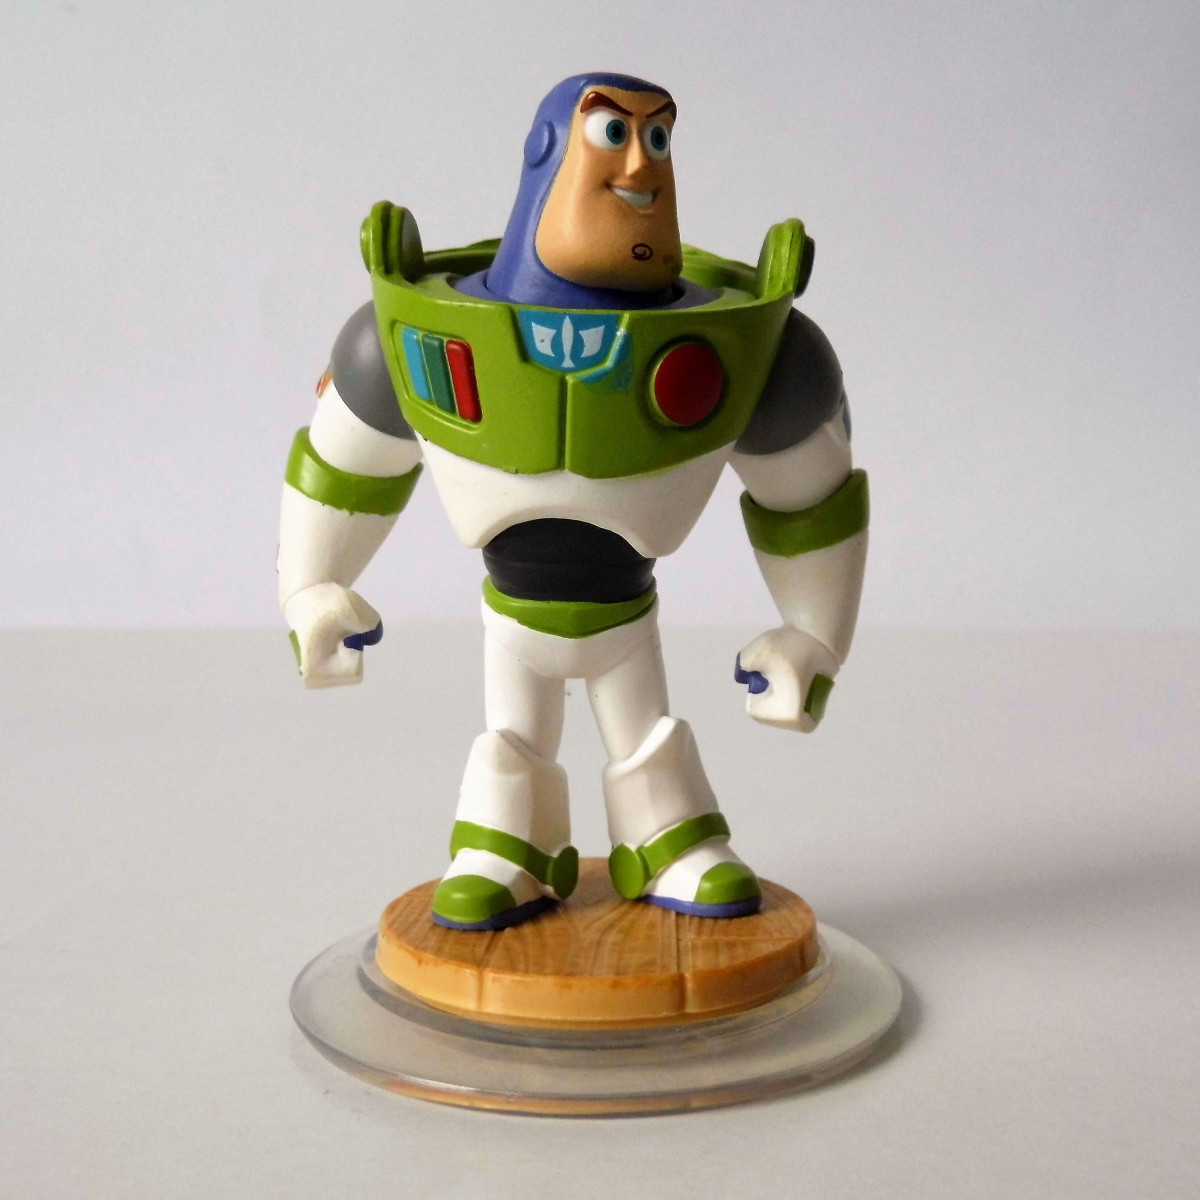 Disney Infinity 1.0 - Buzz Lightyear játékfigura